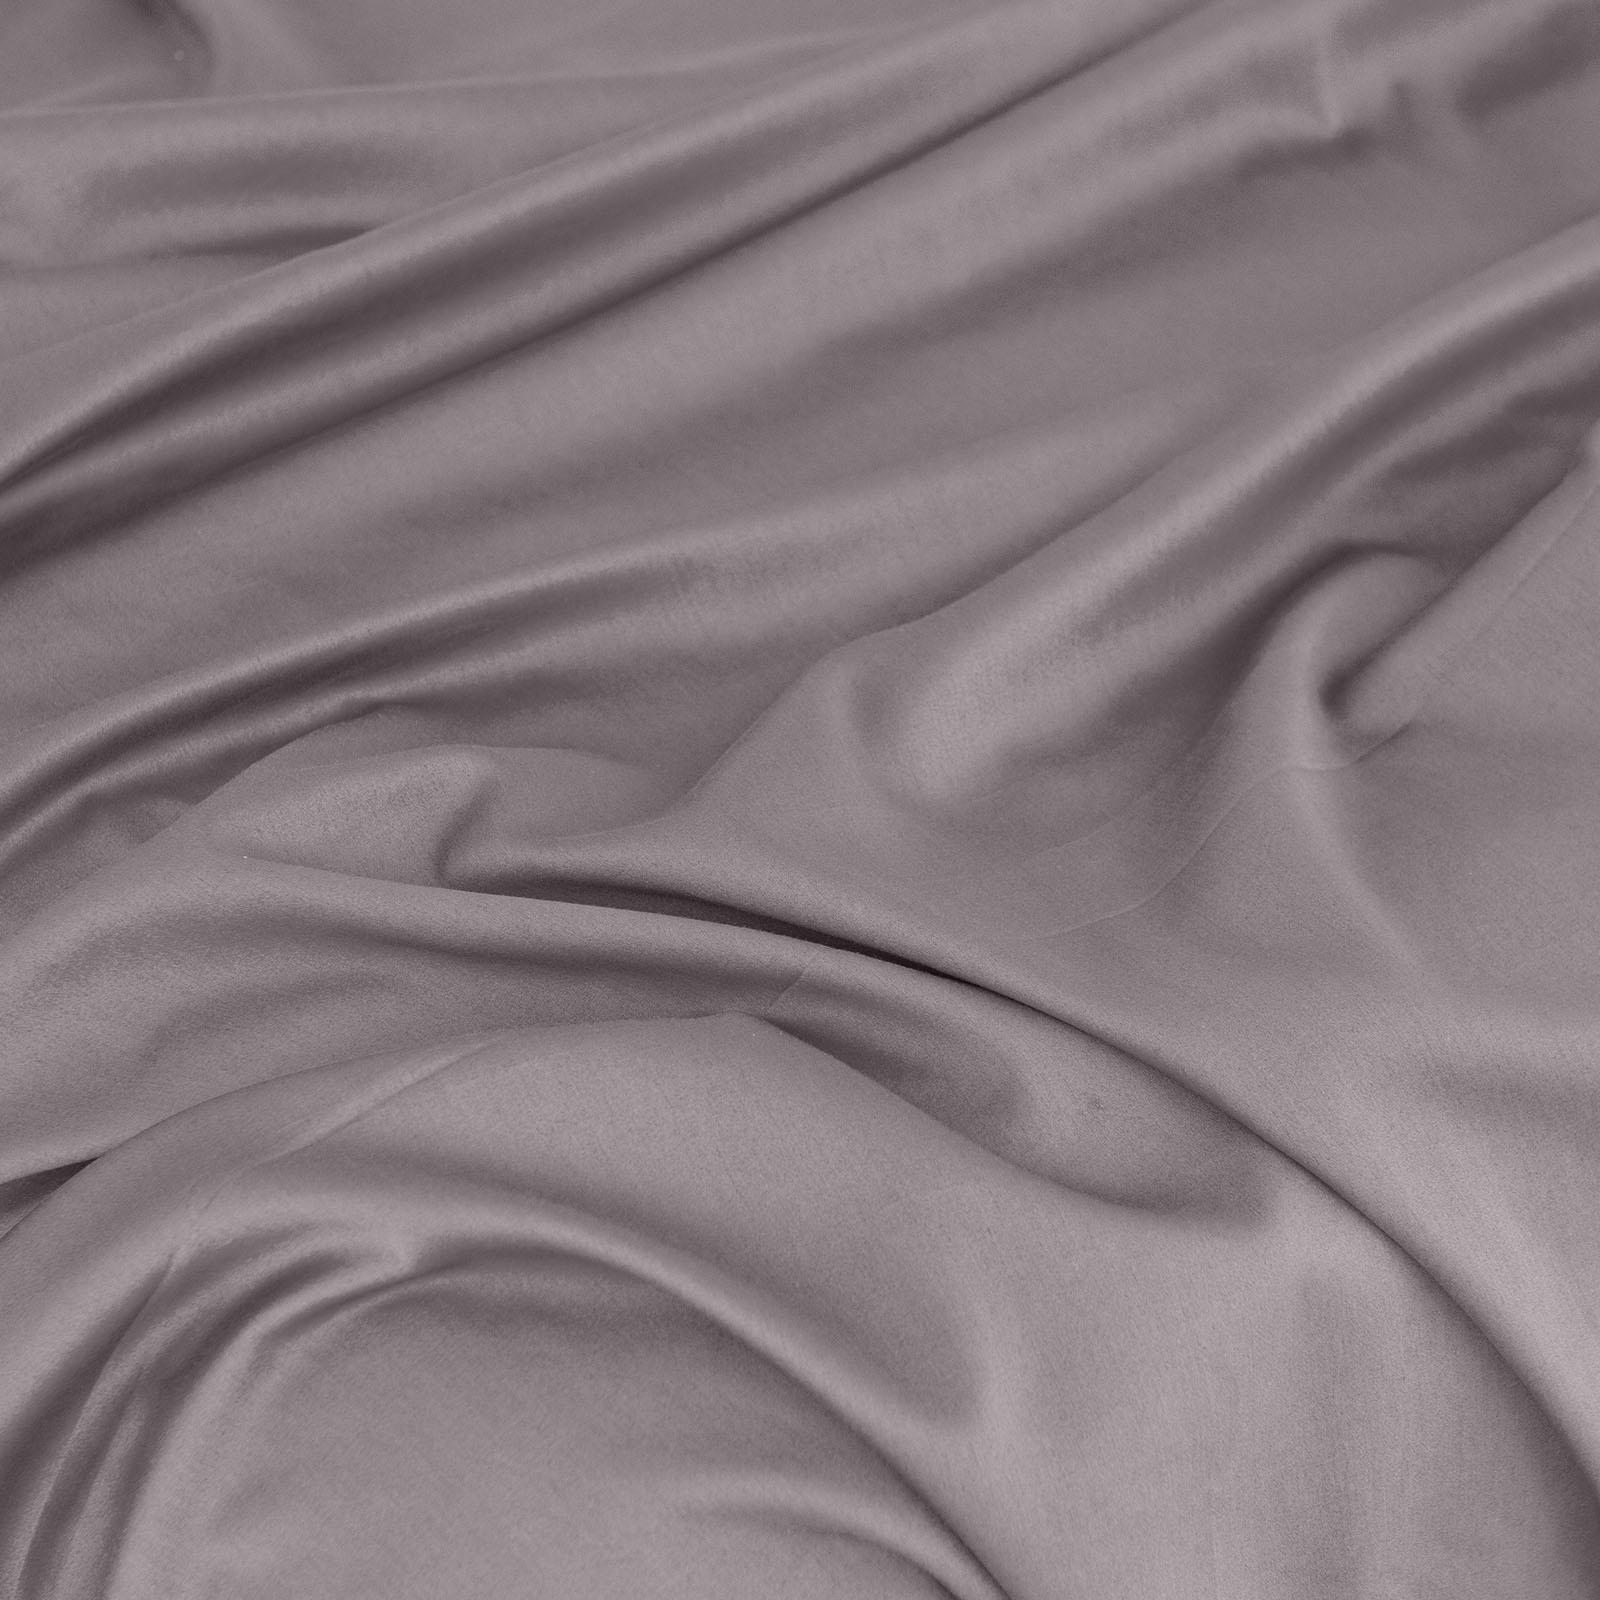 thumbnail 49 - Royal Comfort 1000TC Hotel Grade Bamboo Cotton Sheets Pillowcases Set Ultrasoft